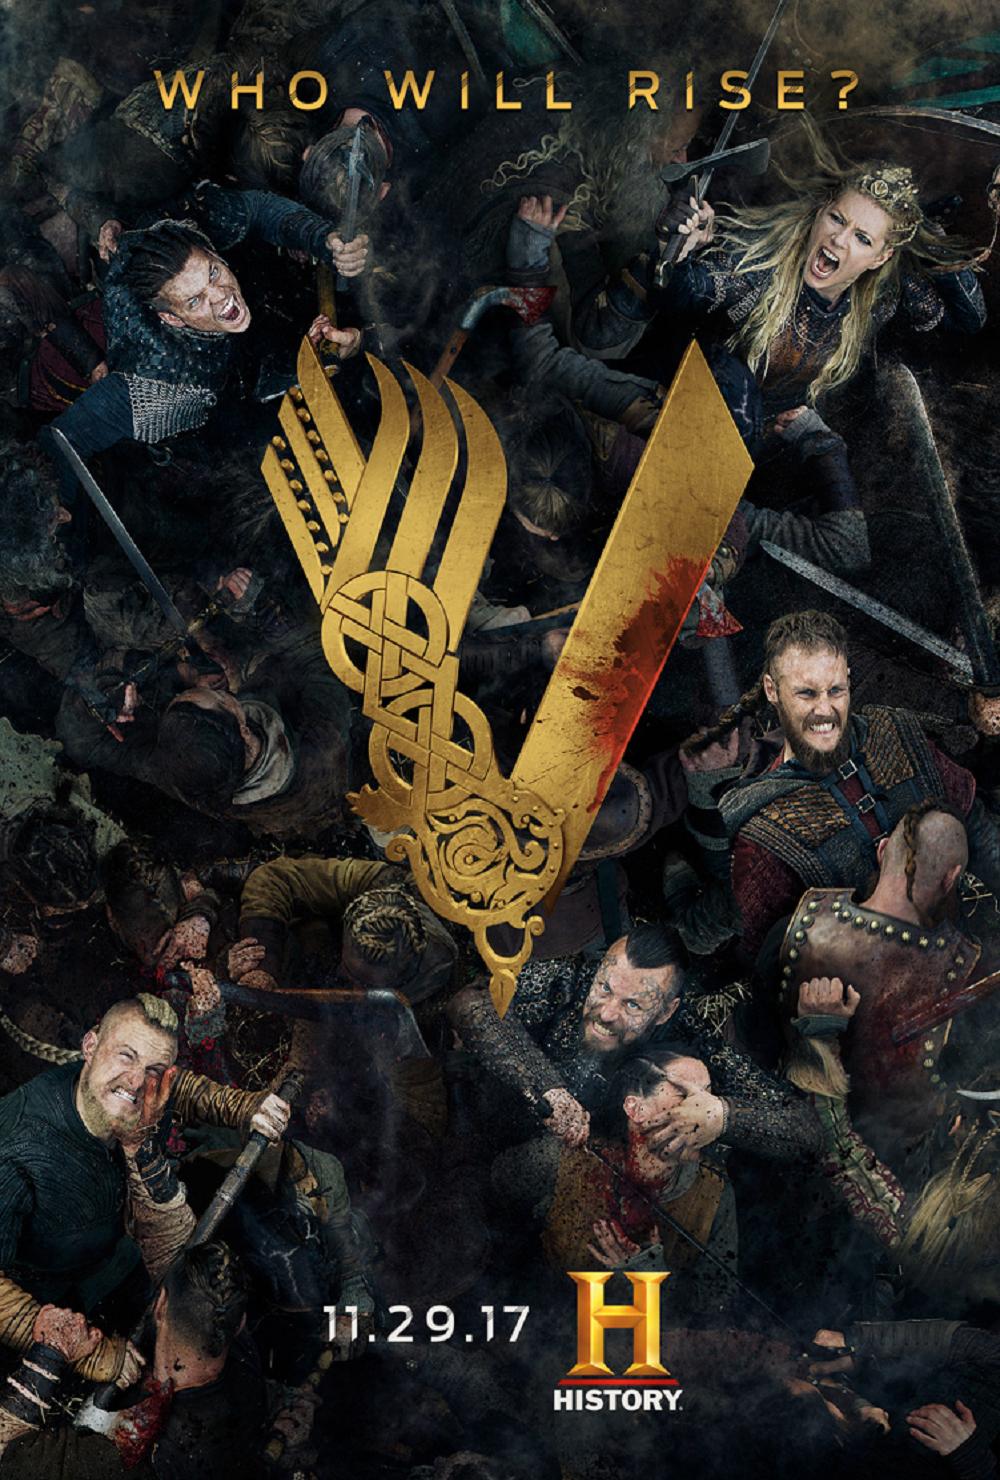 Vikings S05E09 HD 720p – 480p [English]